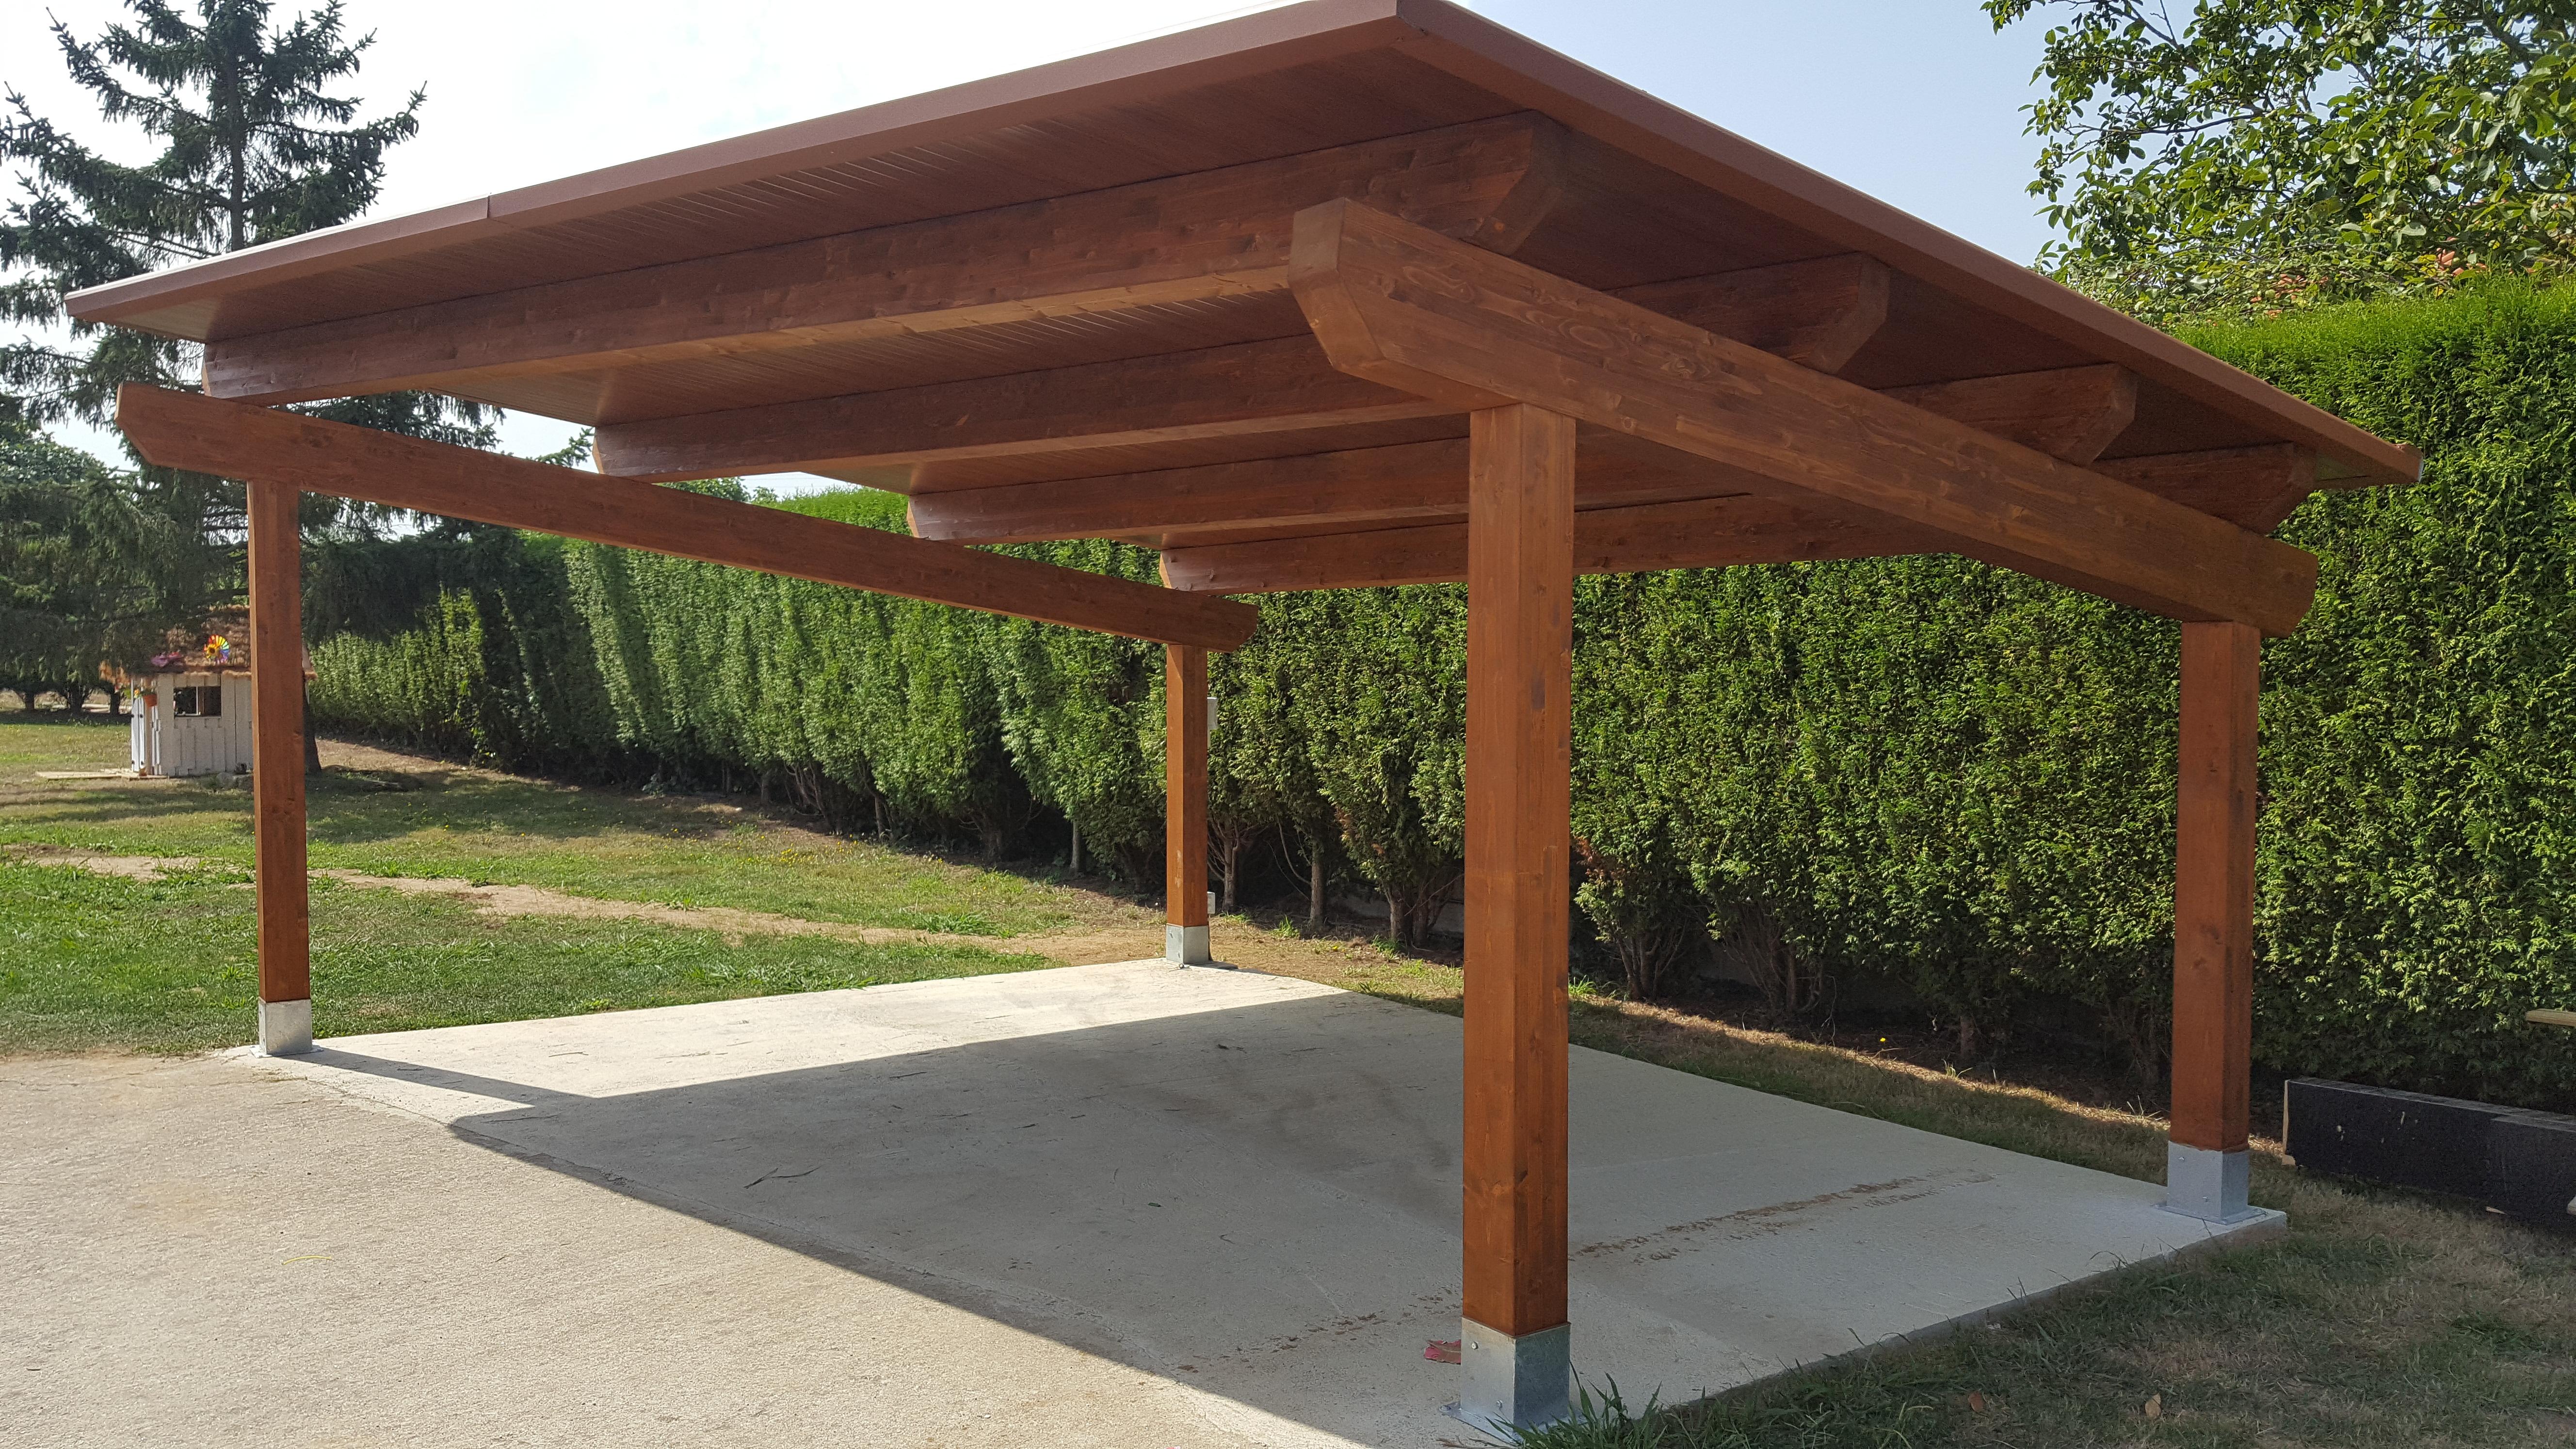 Garaje de madera laminada 6 5 for Garajes modelos